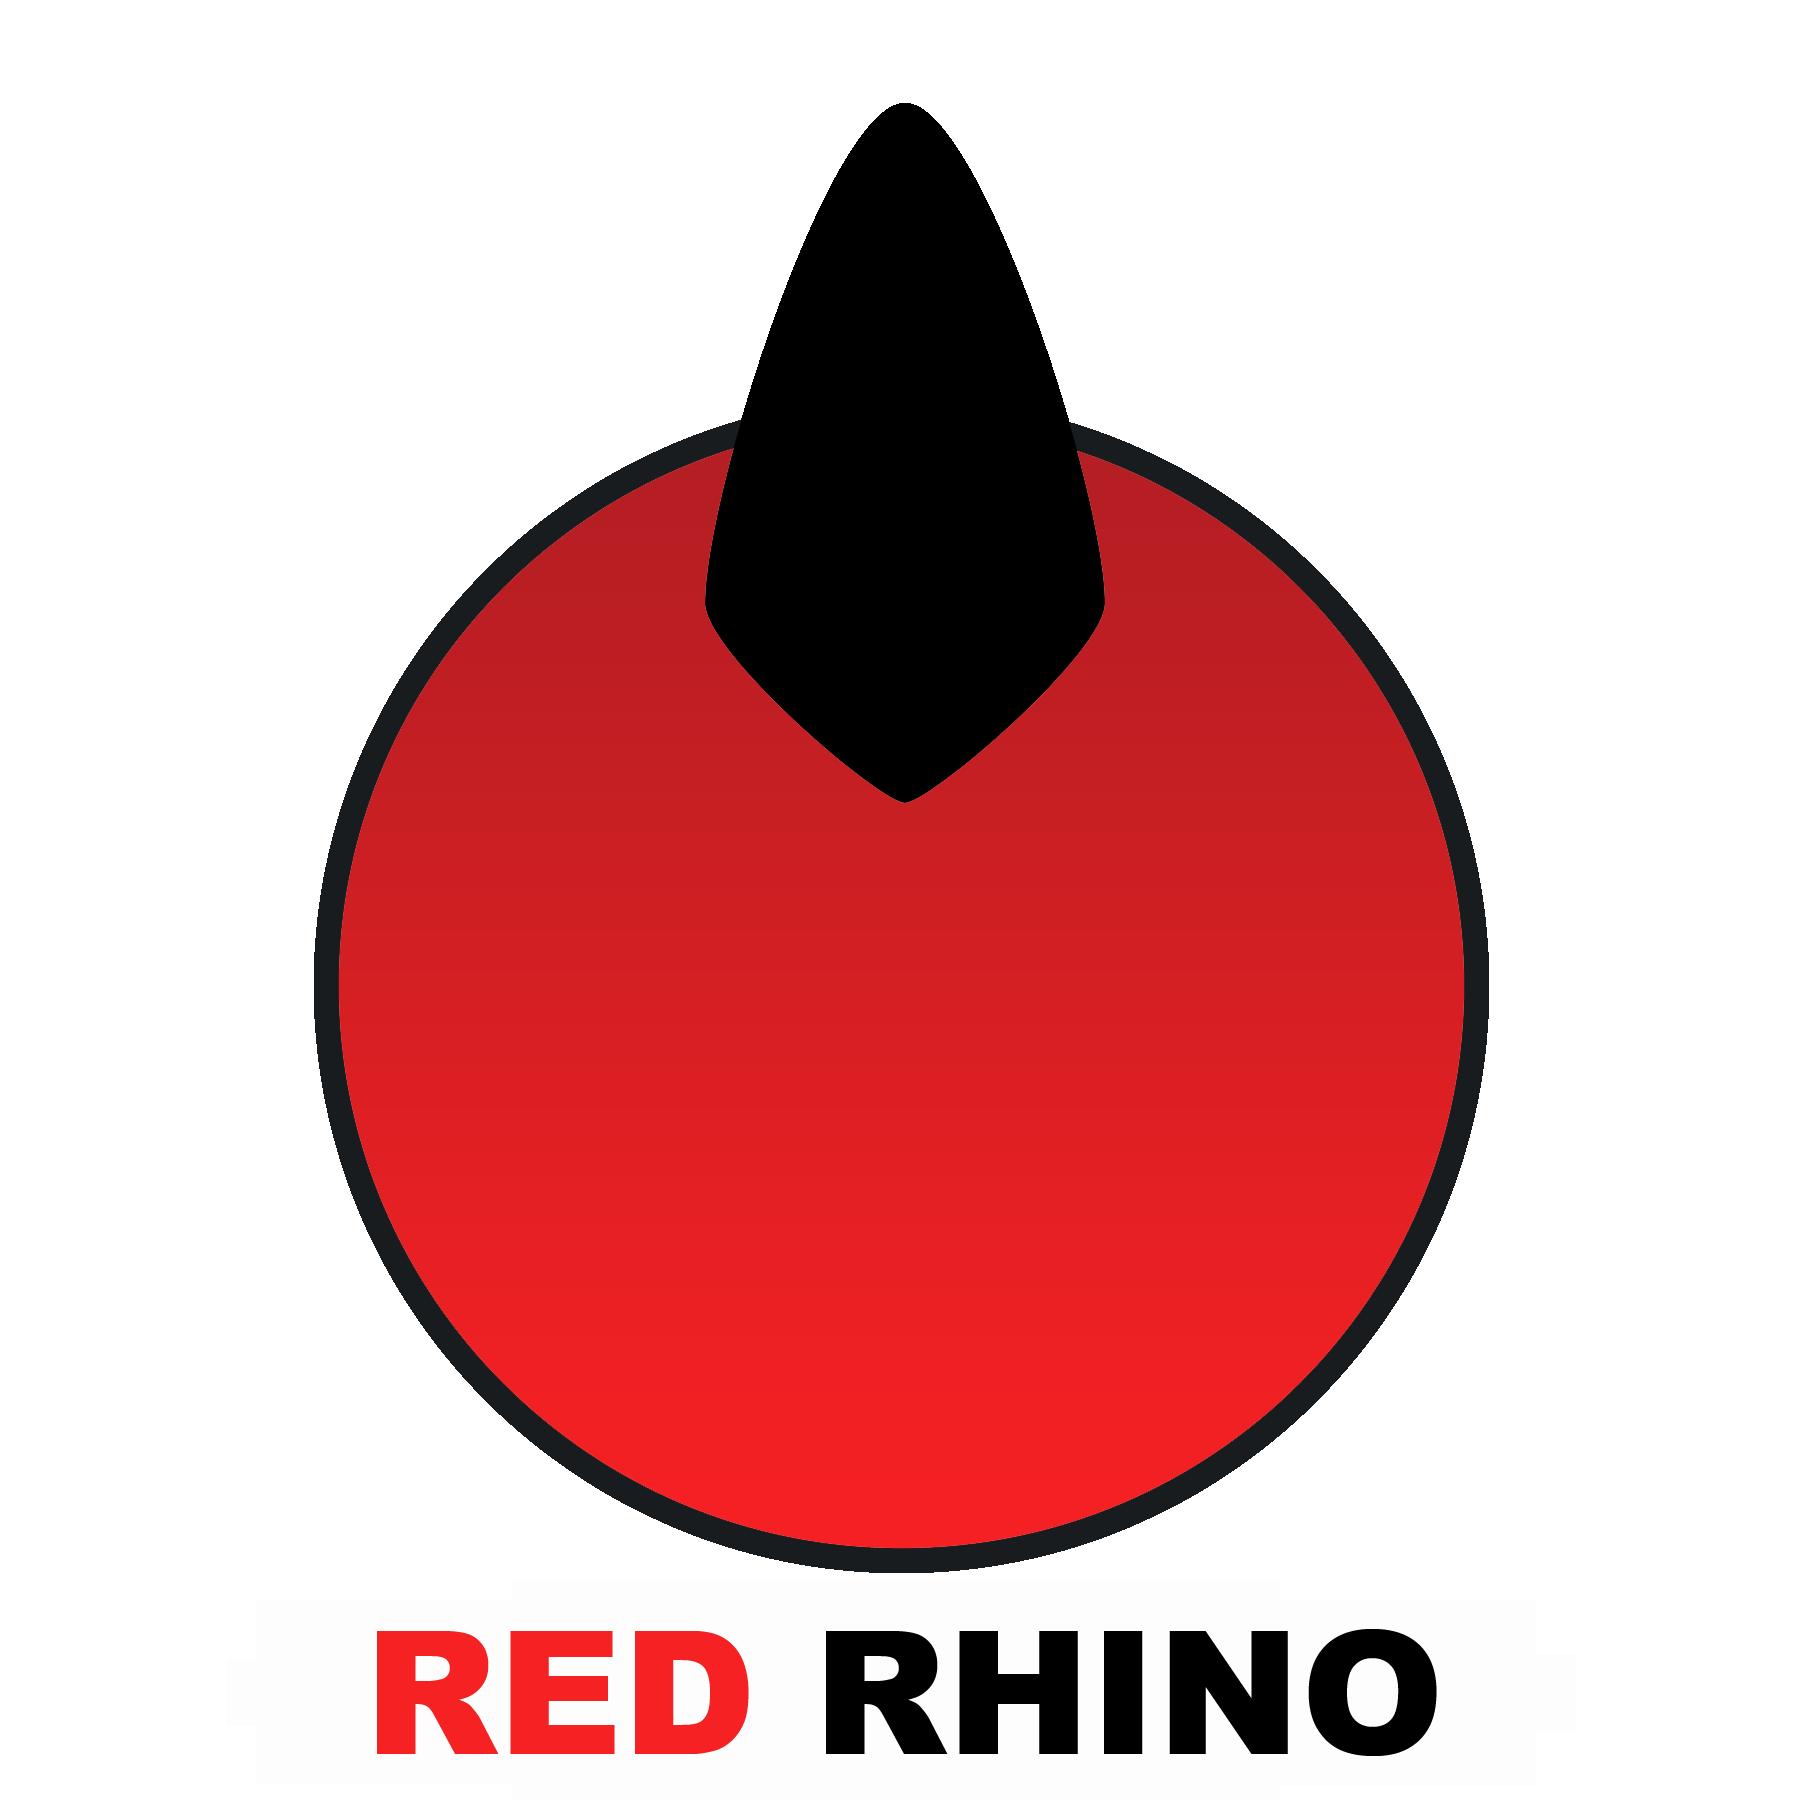 My Red Rhino Symbol